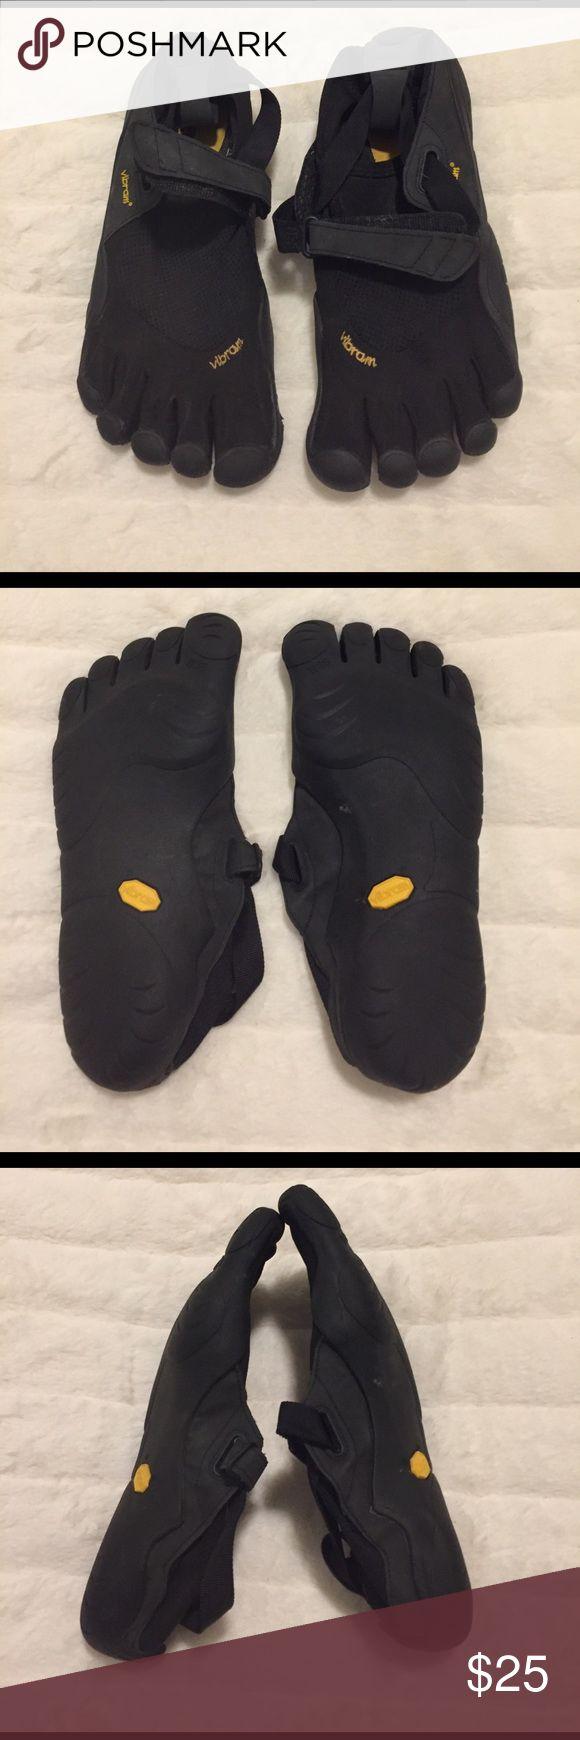 Vibram toe shoes Super comfortable. In good condition. Vibram Shoes